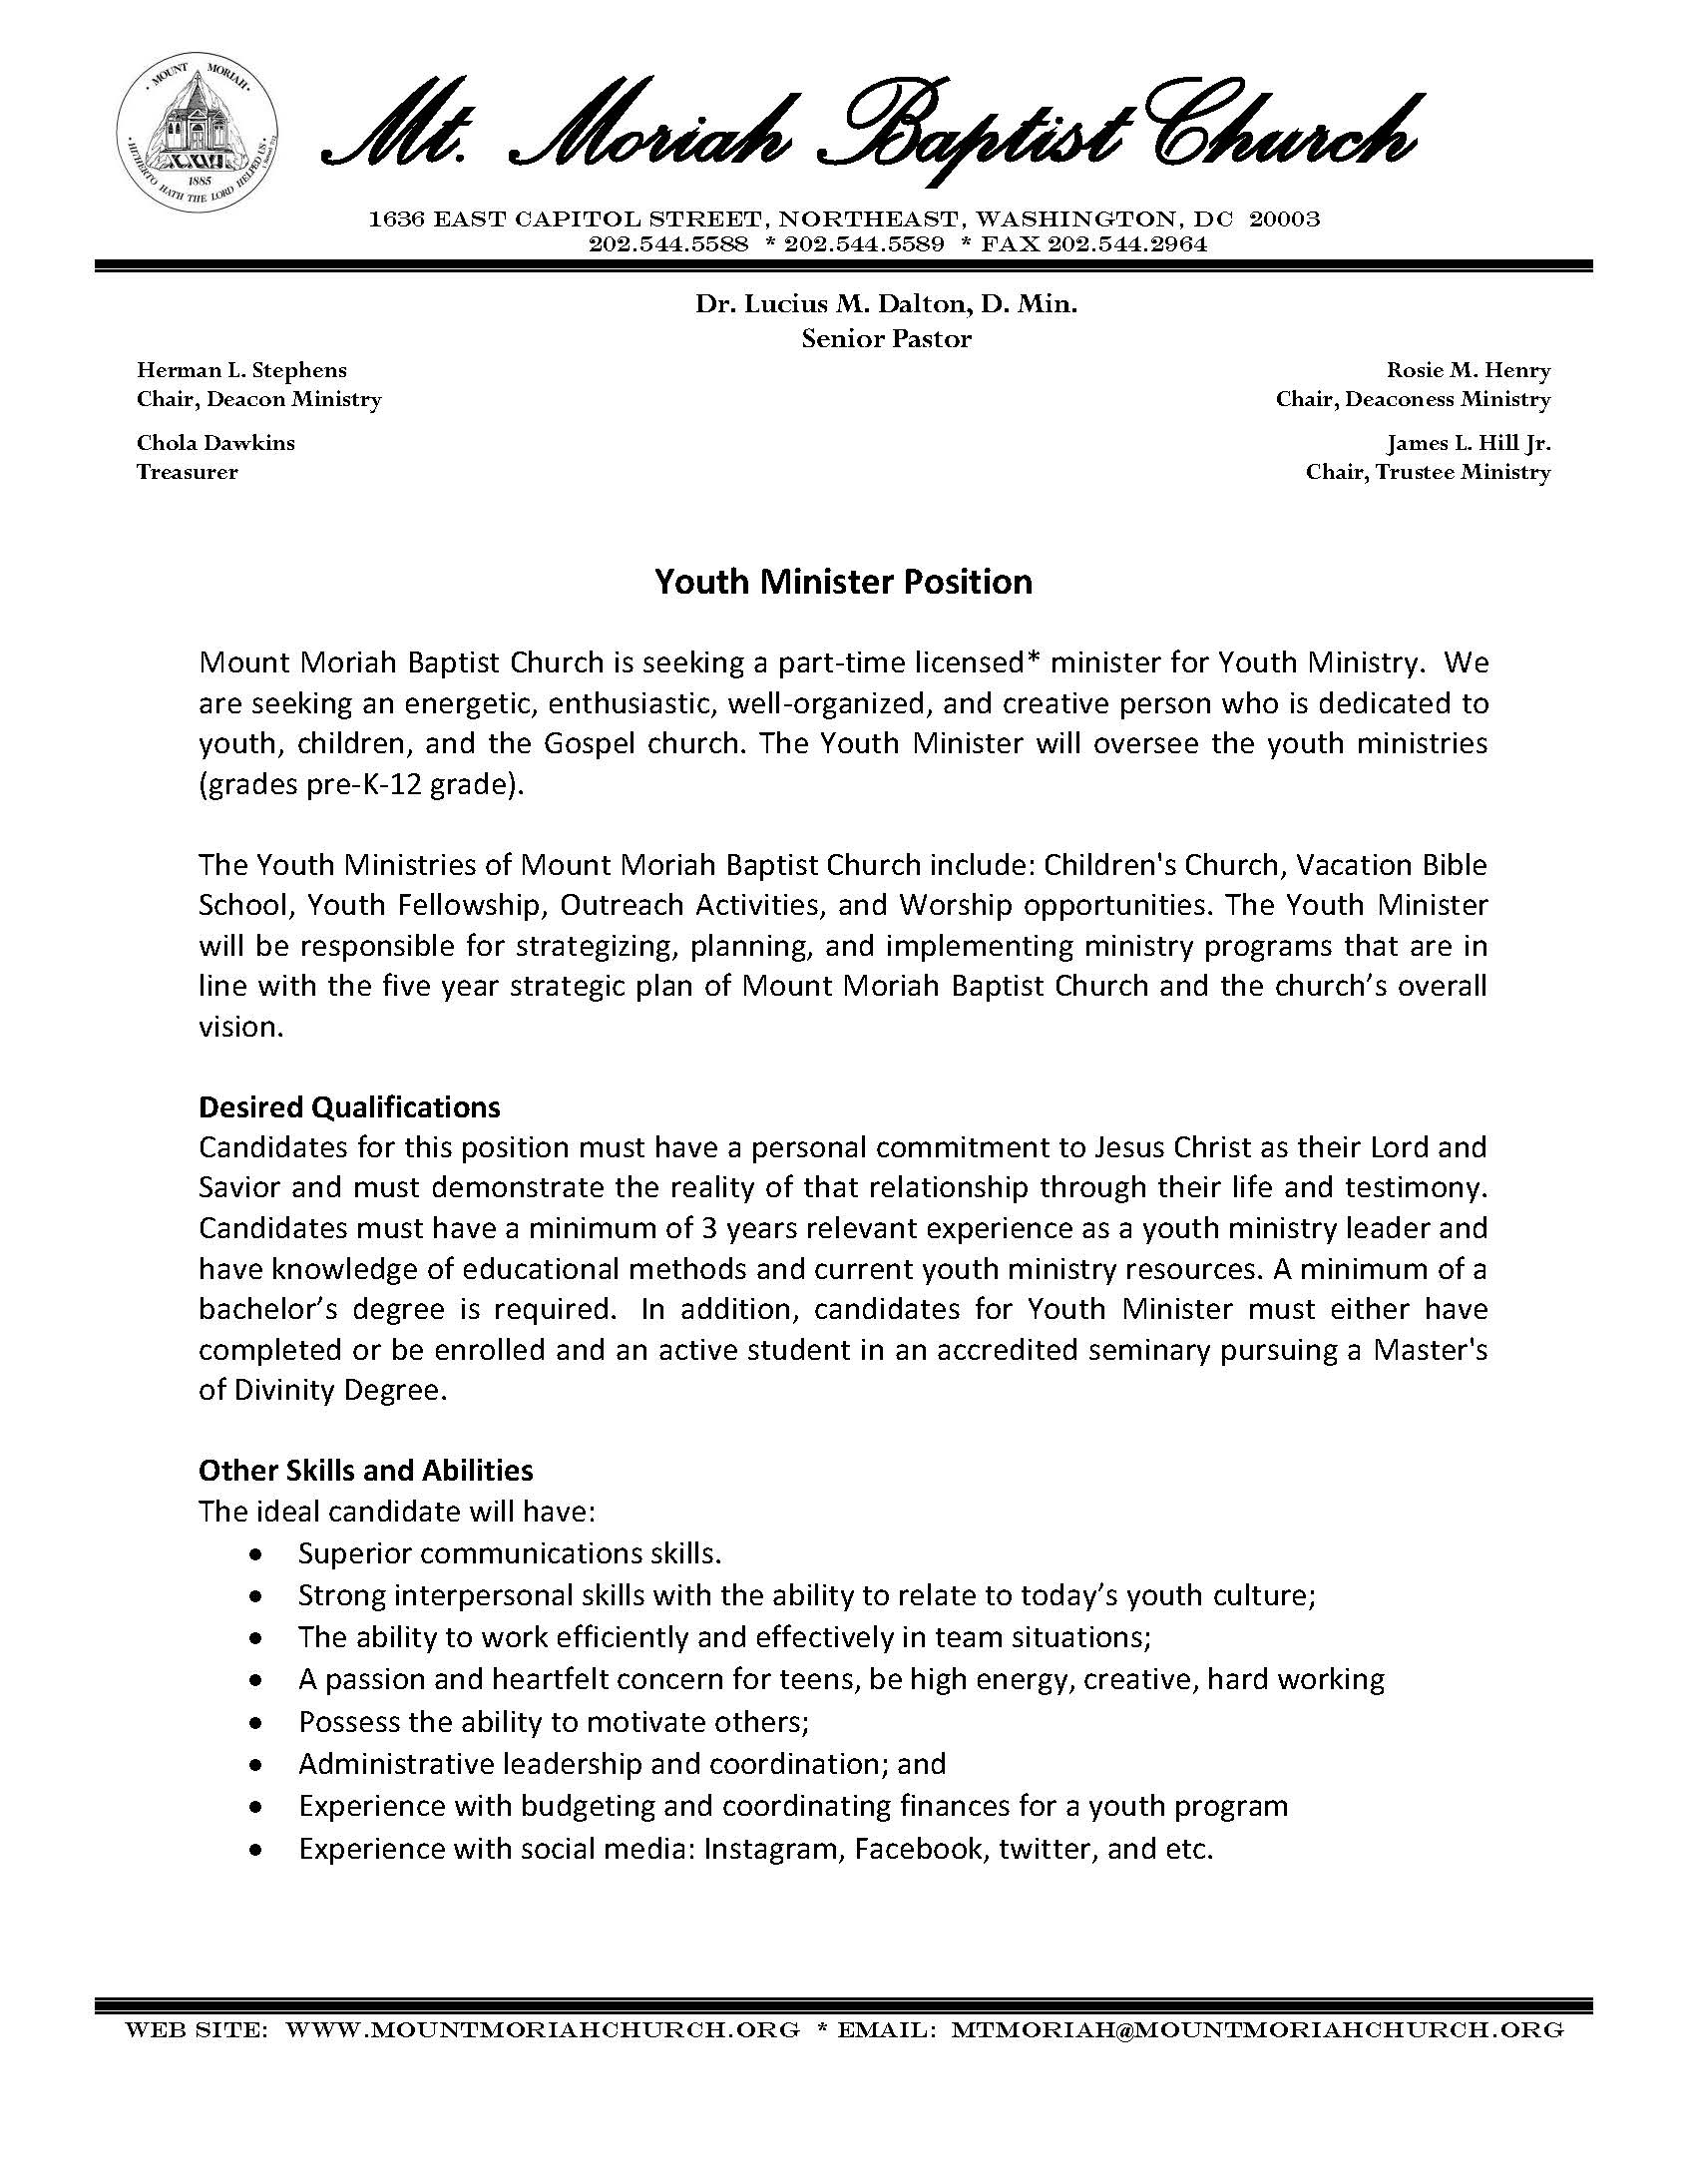 youth minister position mt moriah baptist washington dc